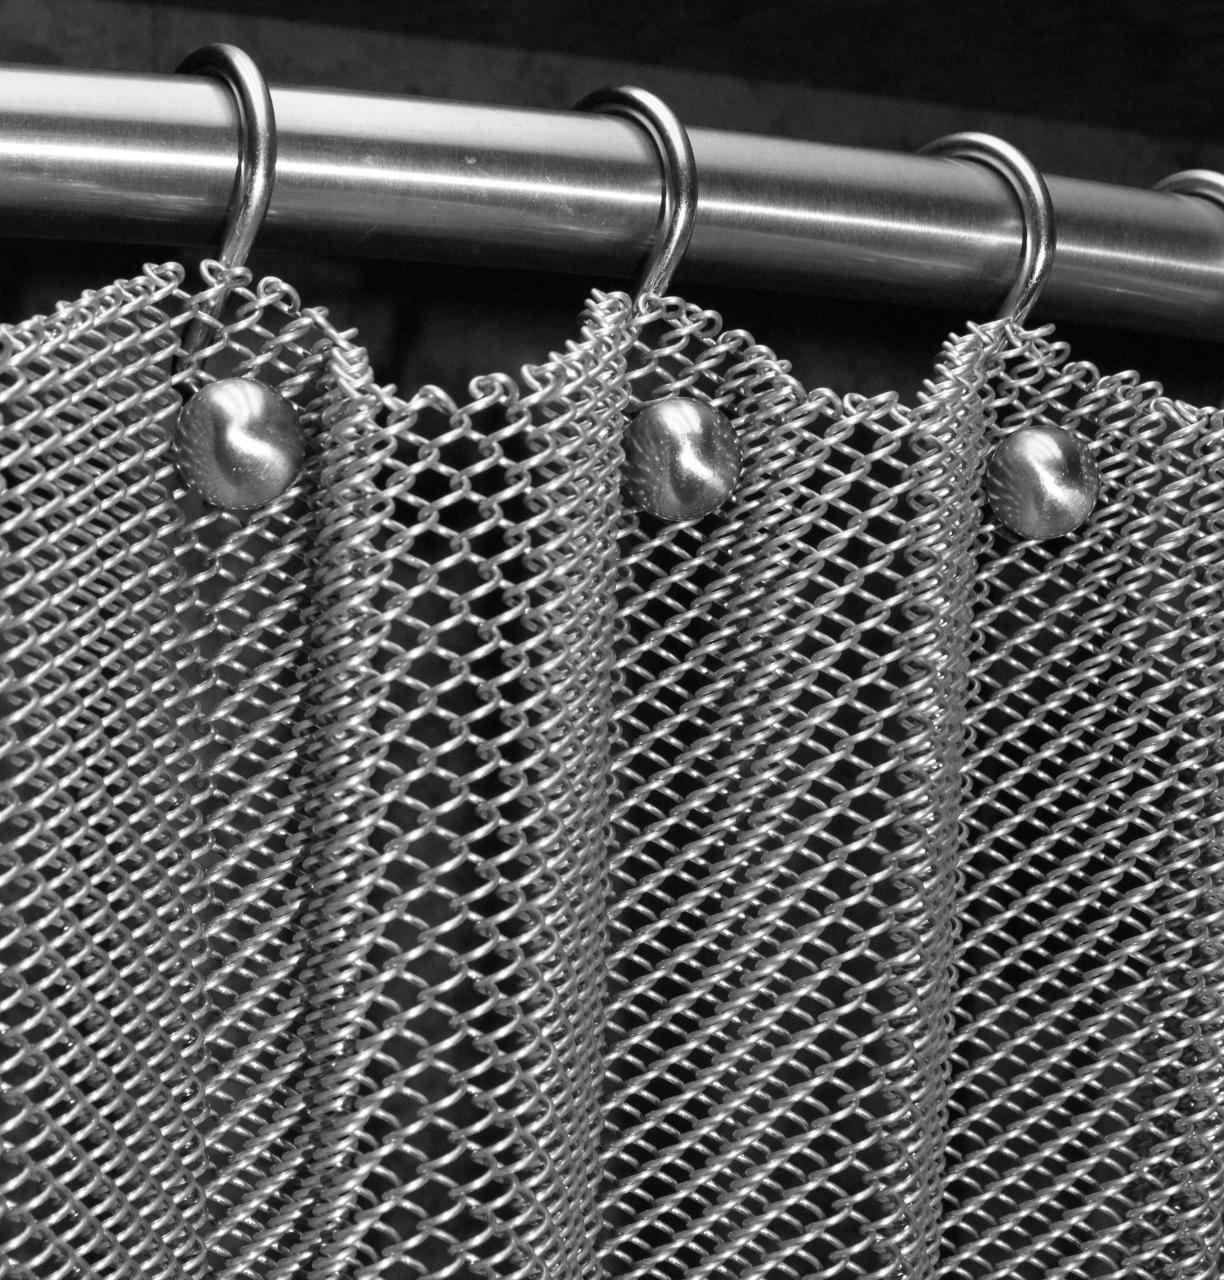 decorative aluminum chain link metal mesh curtain buy chain link metal mesh curtain metal mesh curtain metallic shower curtain product on